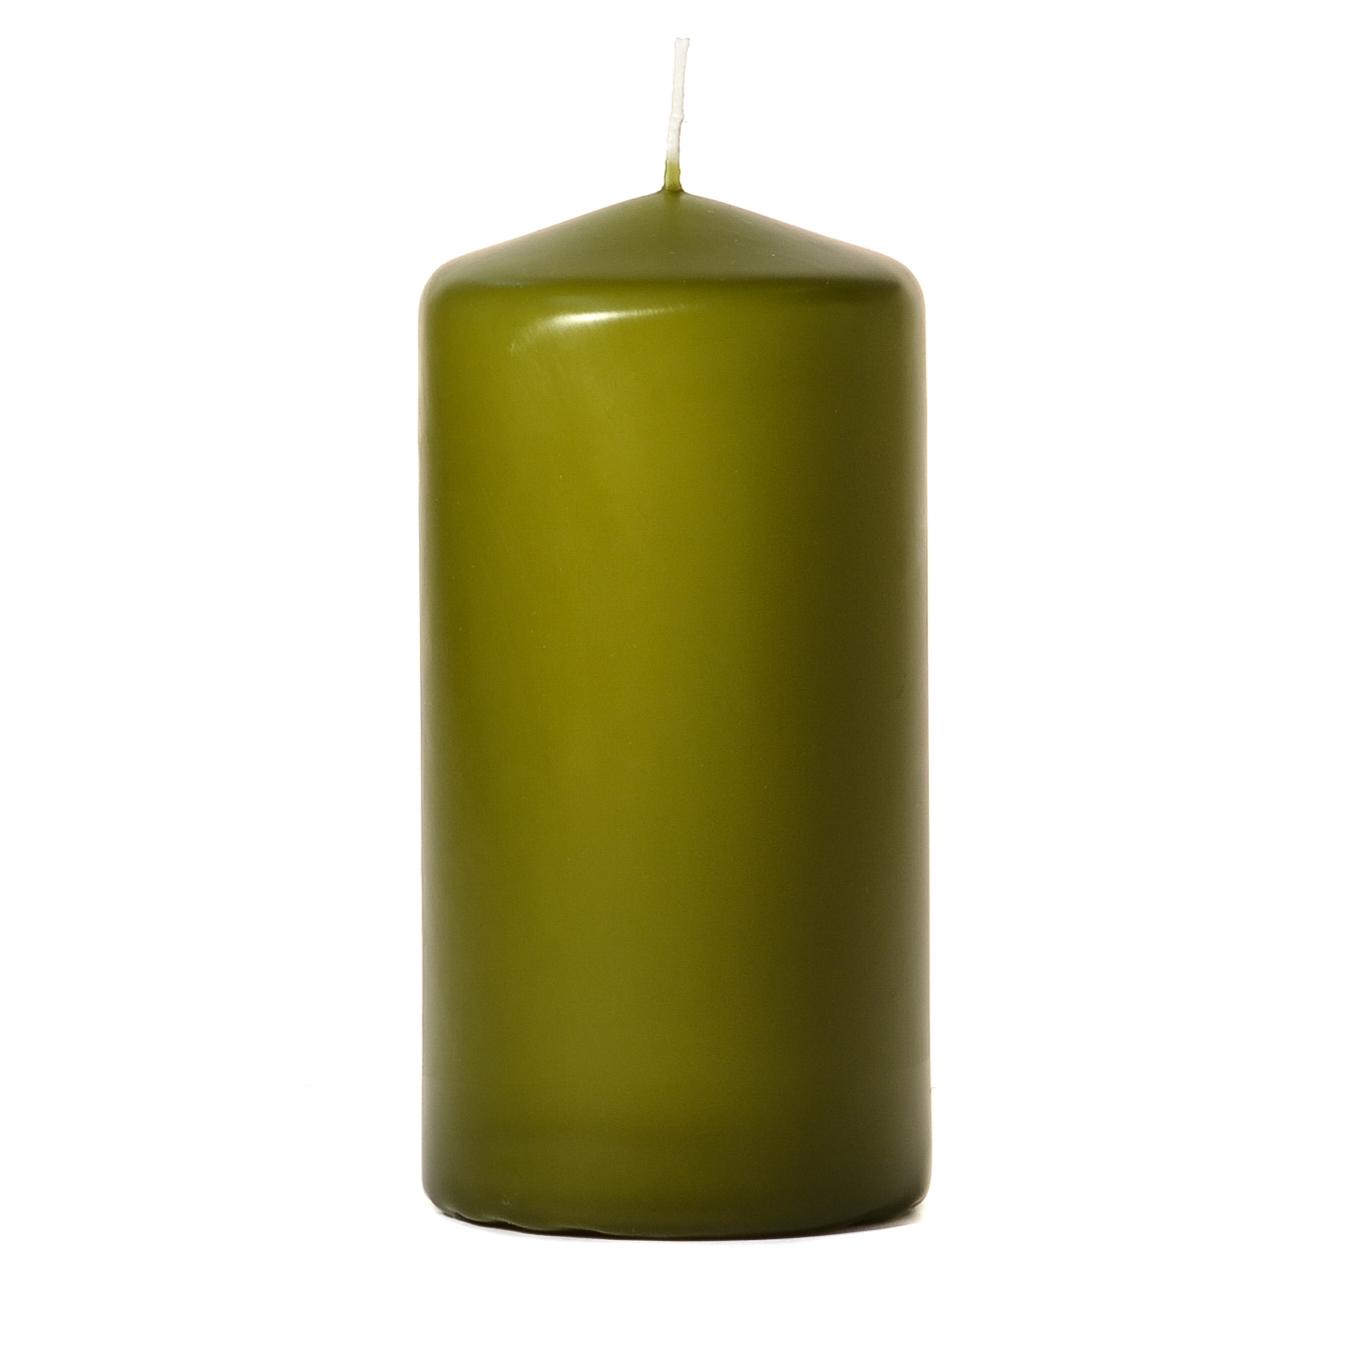 3x6 Sage Pillar Candles Unscented